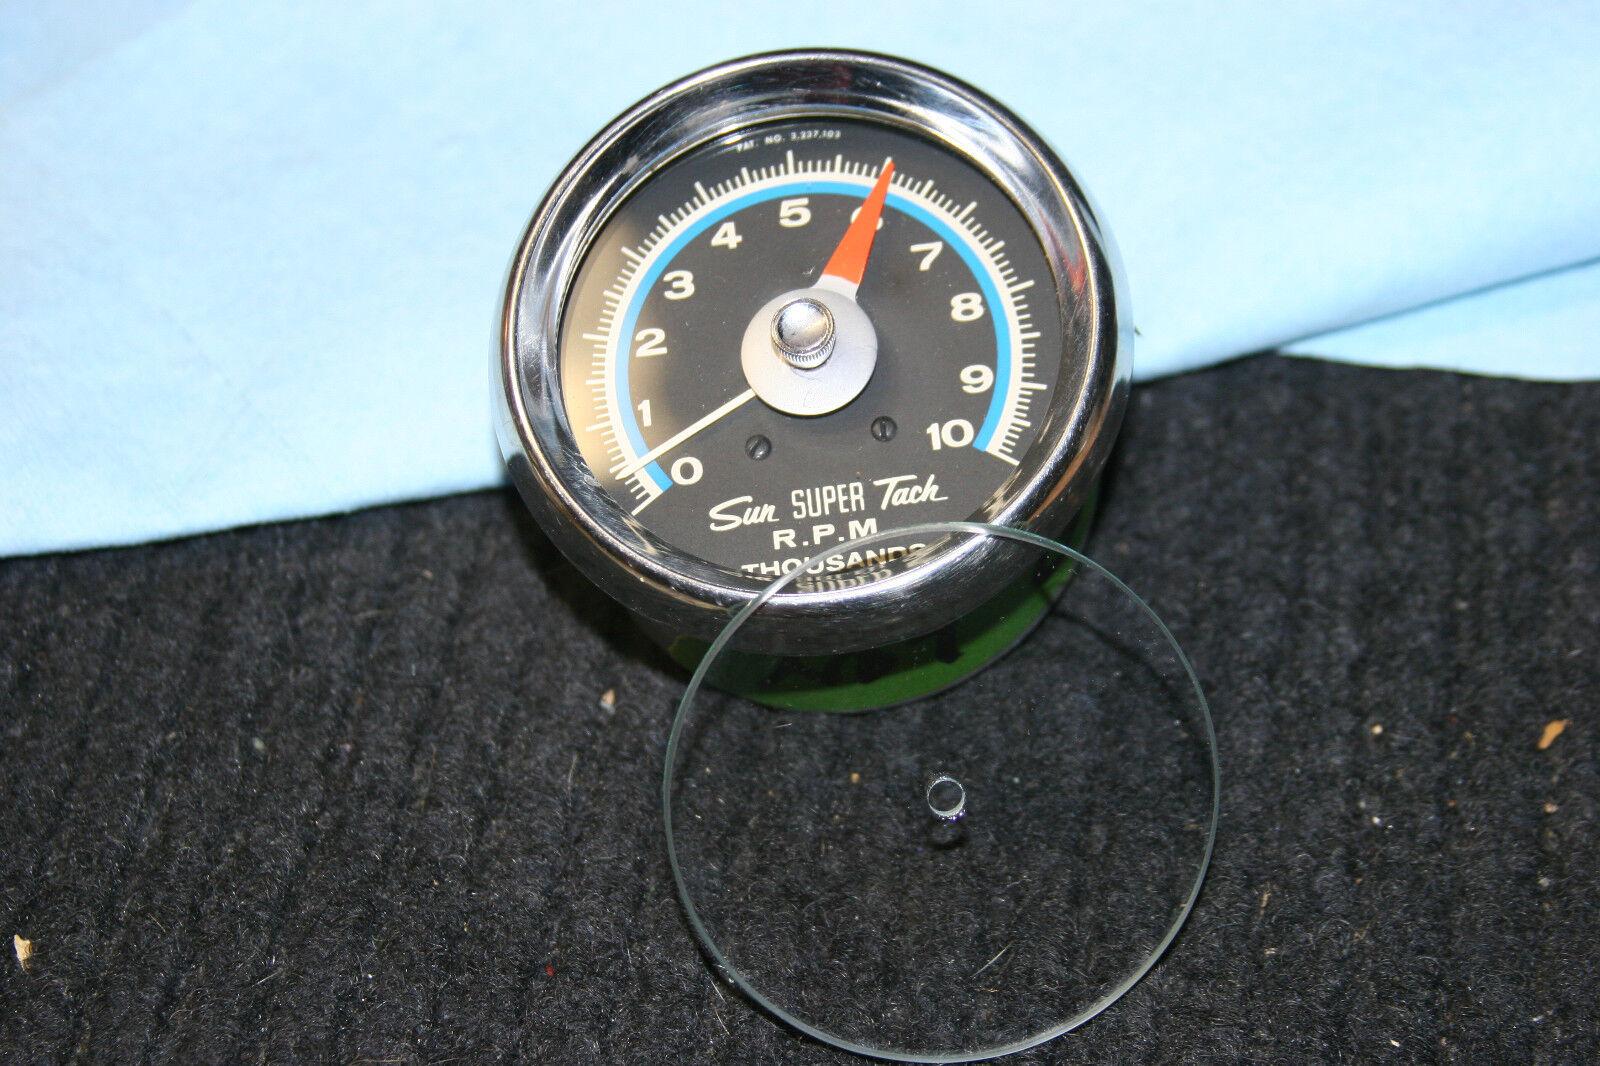 sun super tach tachometer replacement glass • 17 00 picclick sun super tach tachometer replacement glass 3 3 of 4